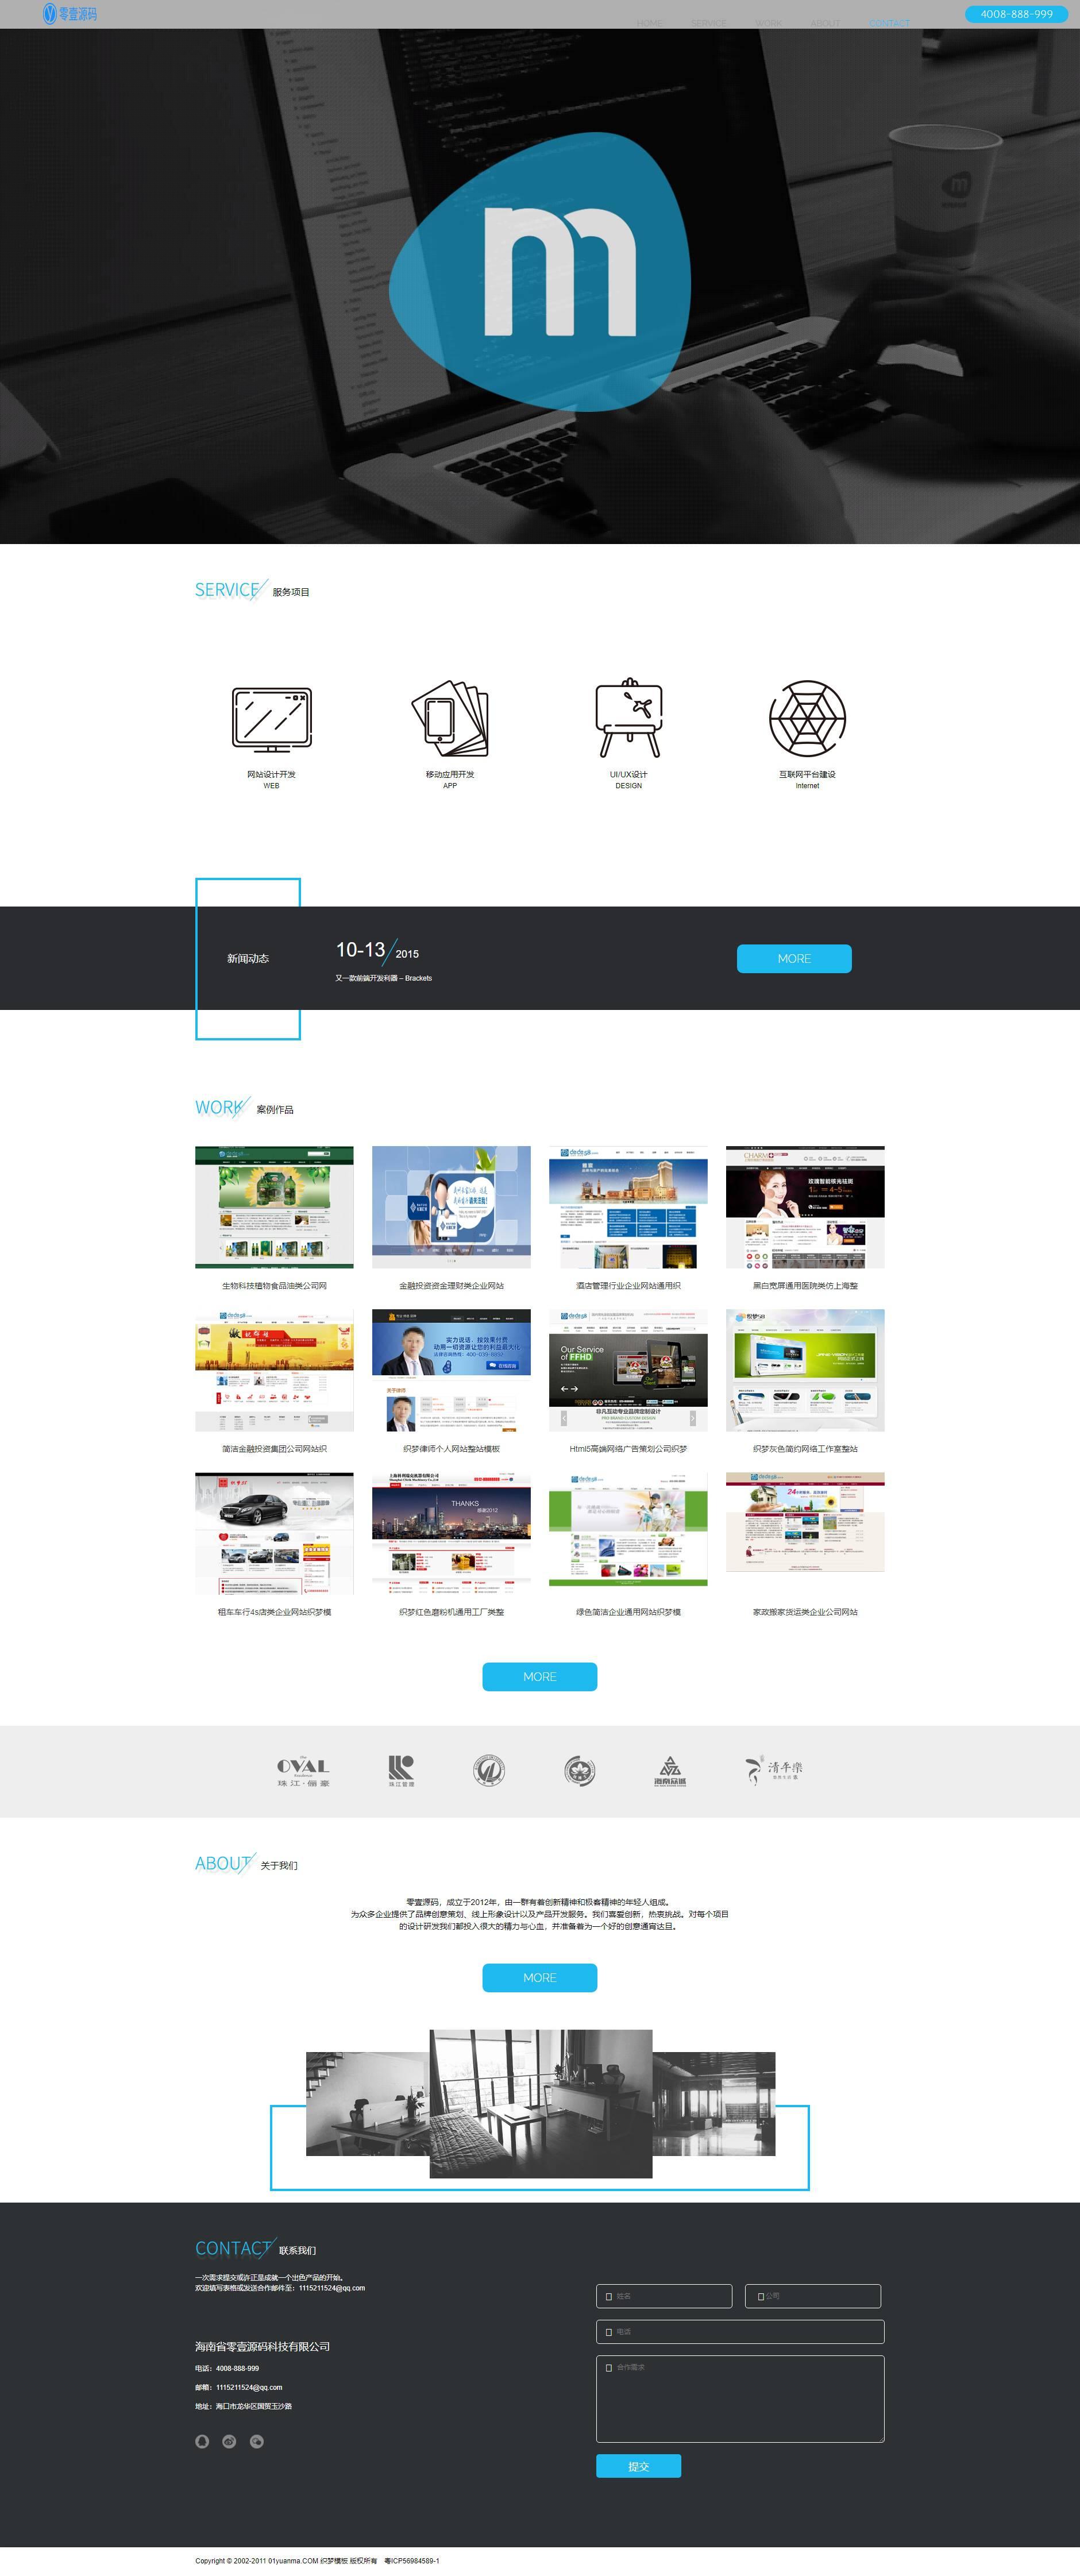 html5高端网络建站设计工作室网站织梦dedecms模板